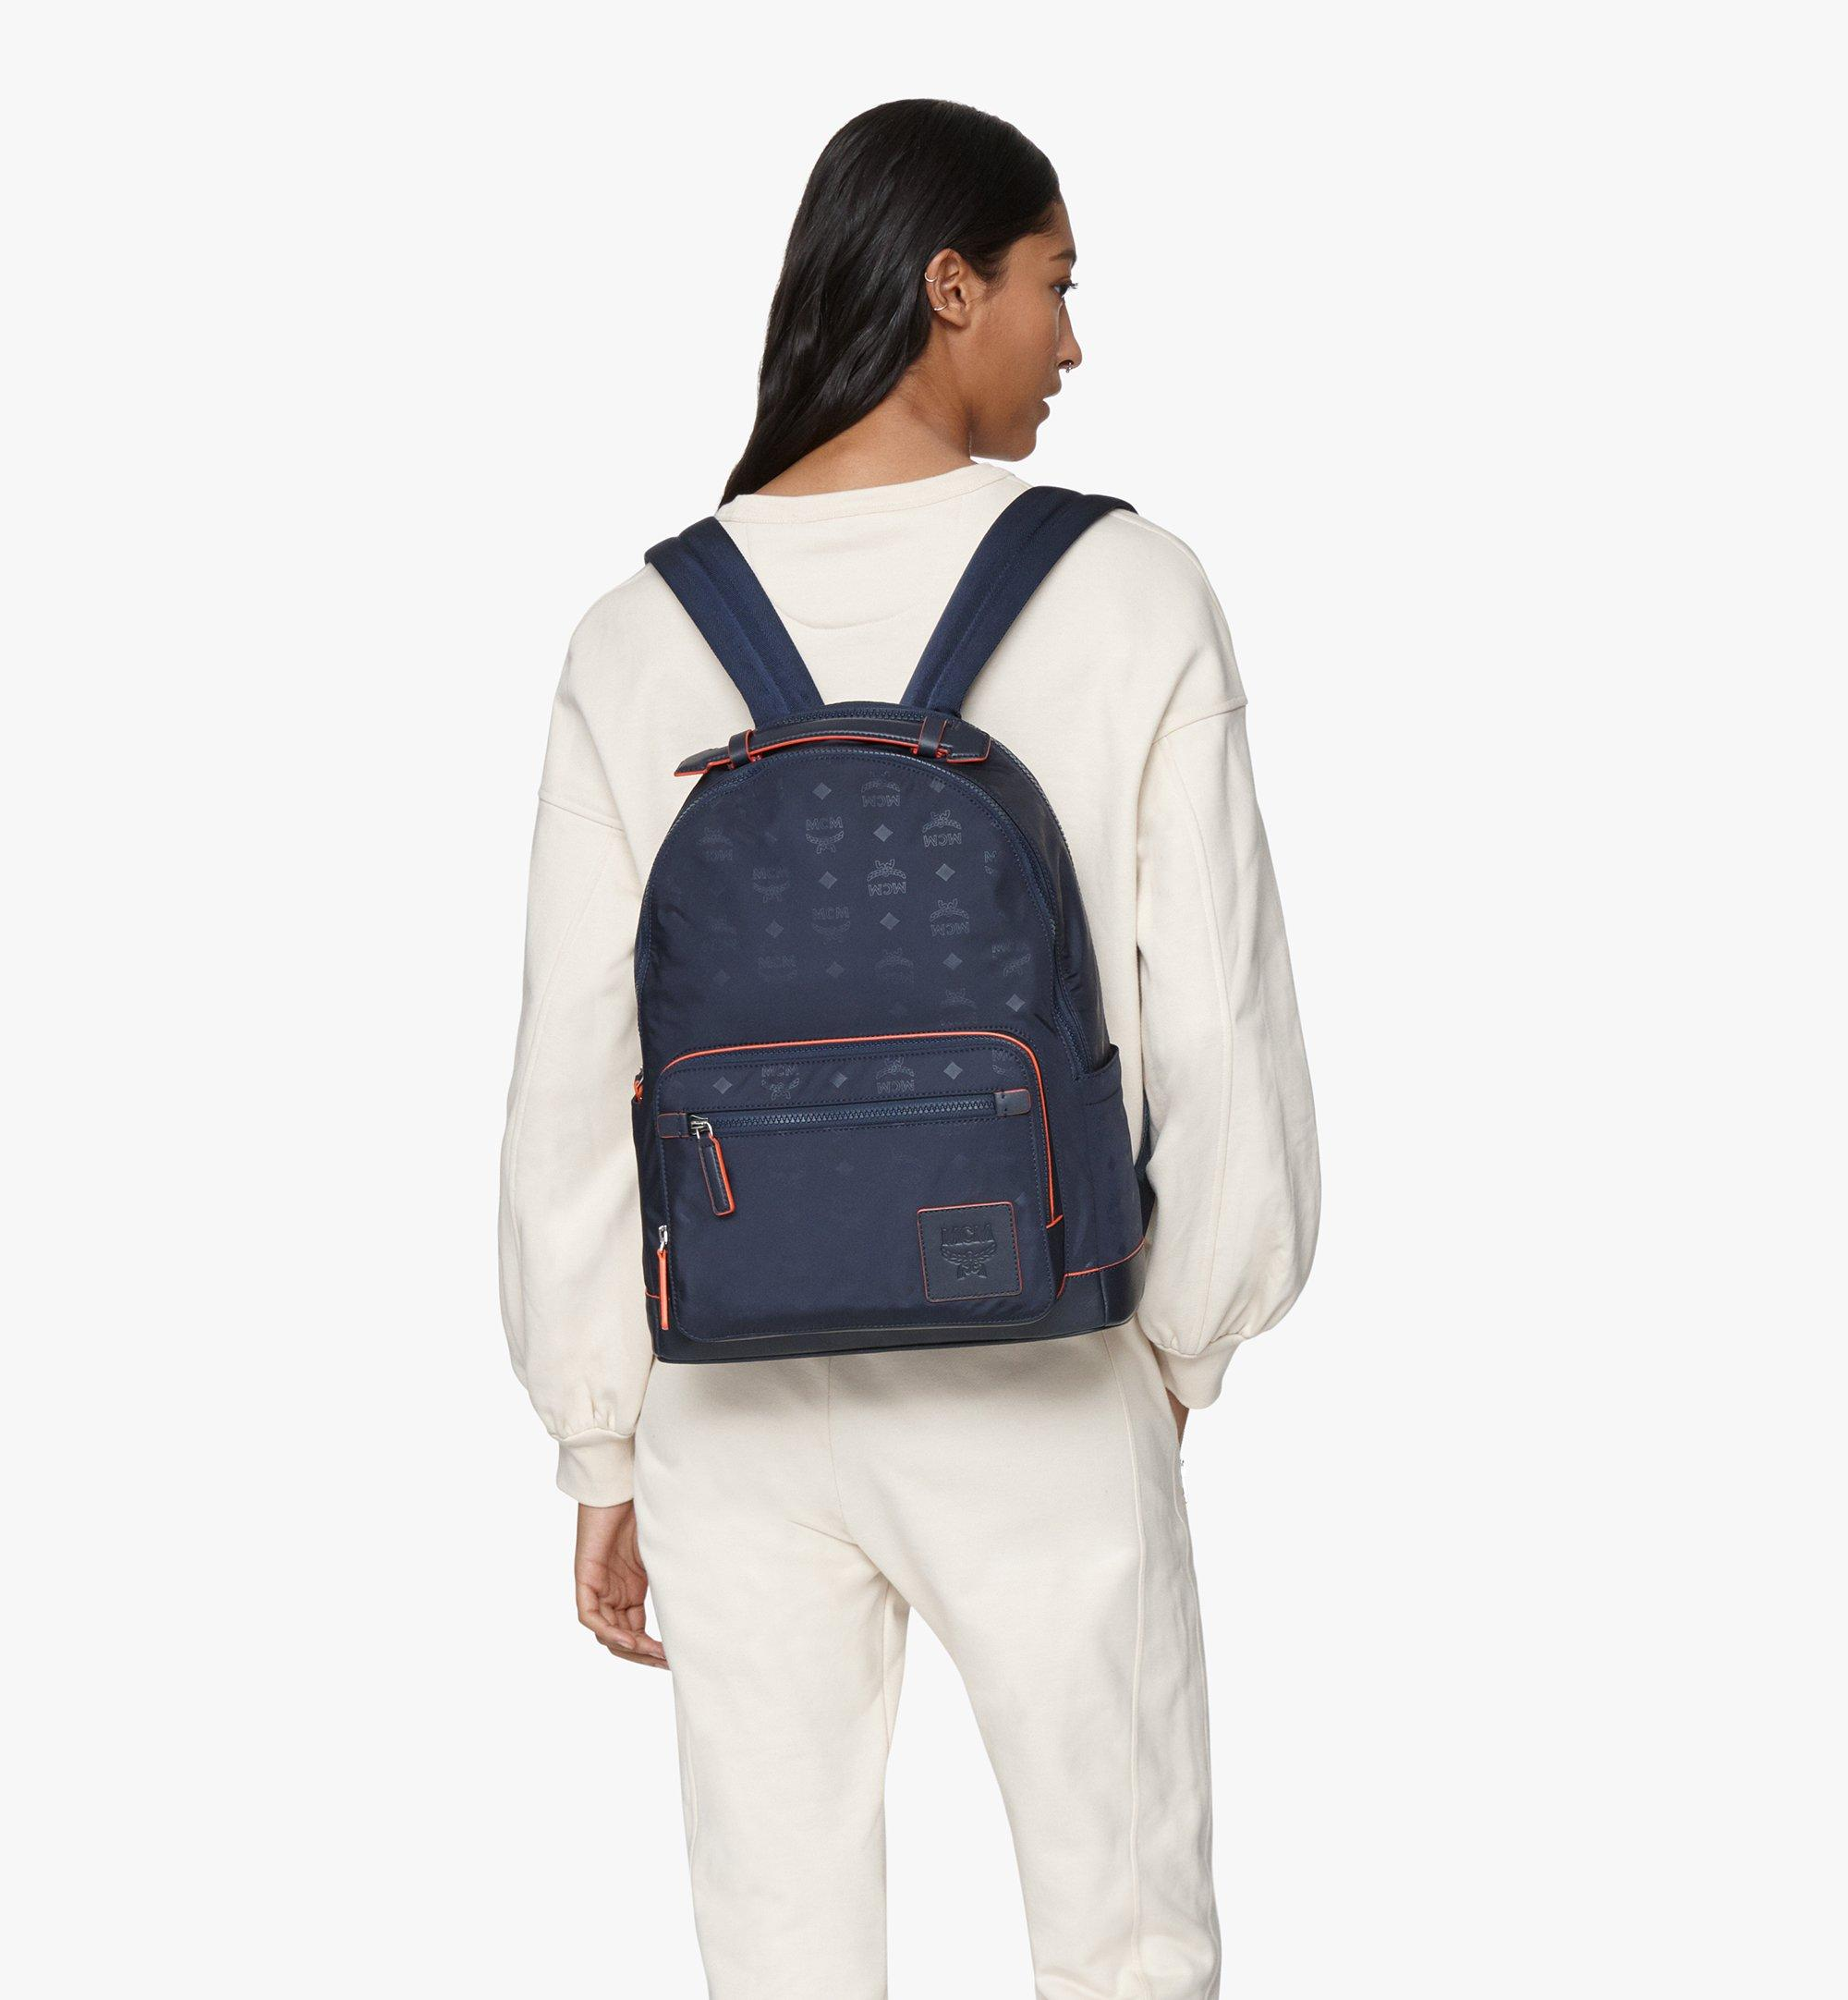 MCM Stark Backpack in Monogram Nylon Navy MMKASVE24VA001 Alternate View 3